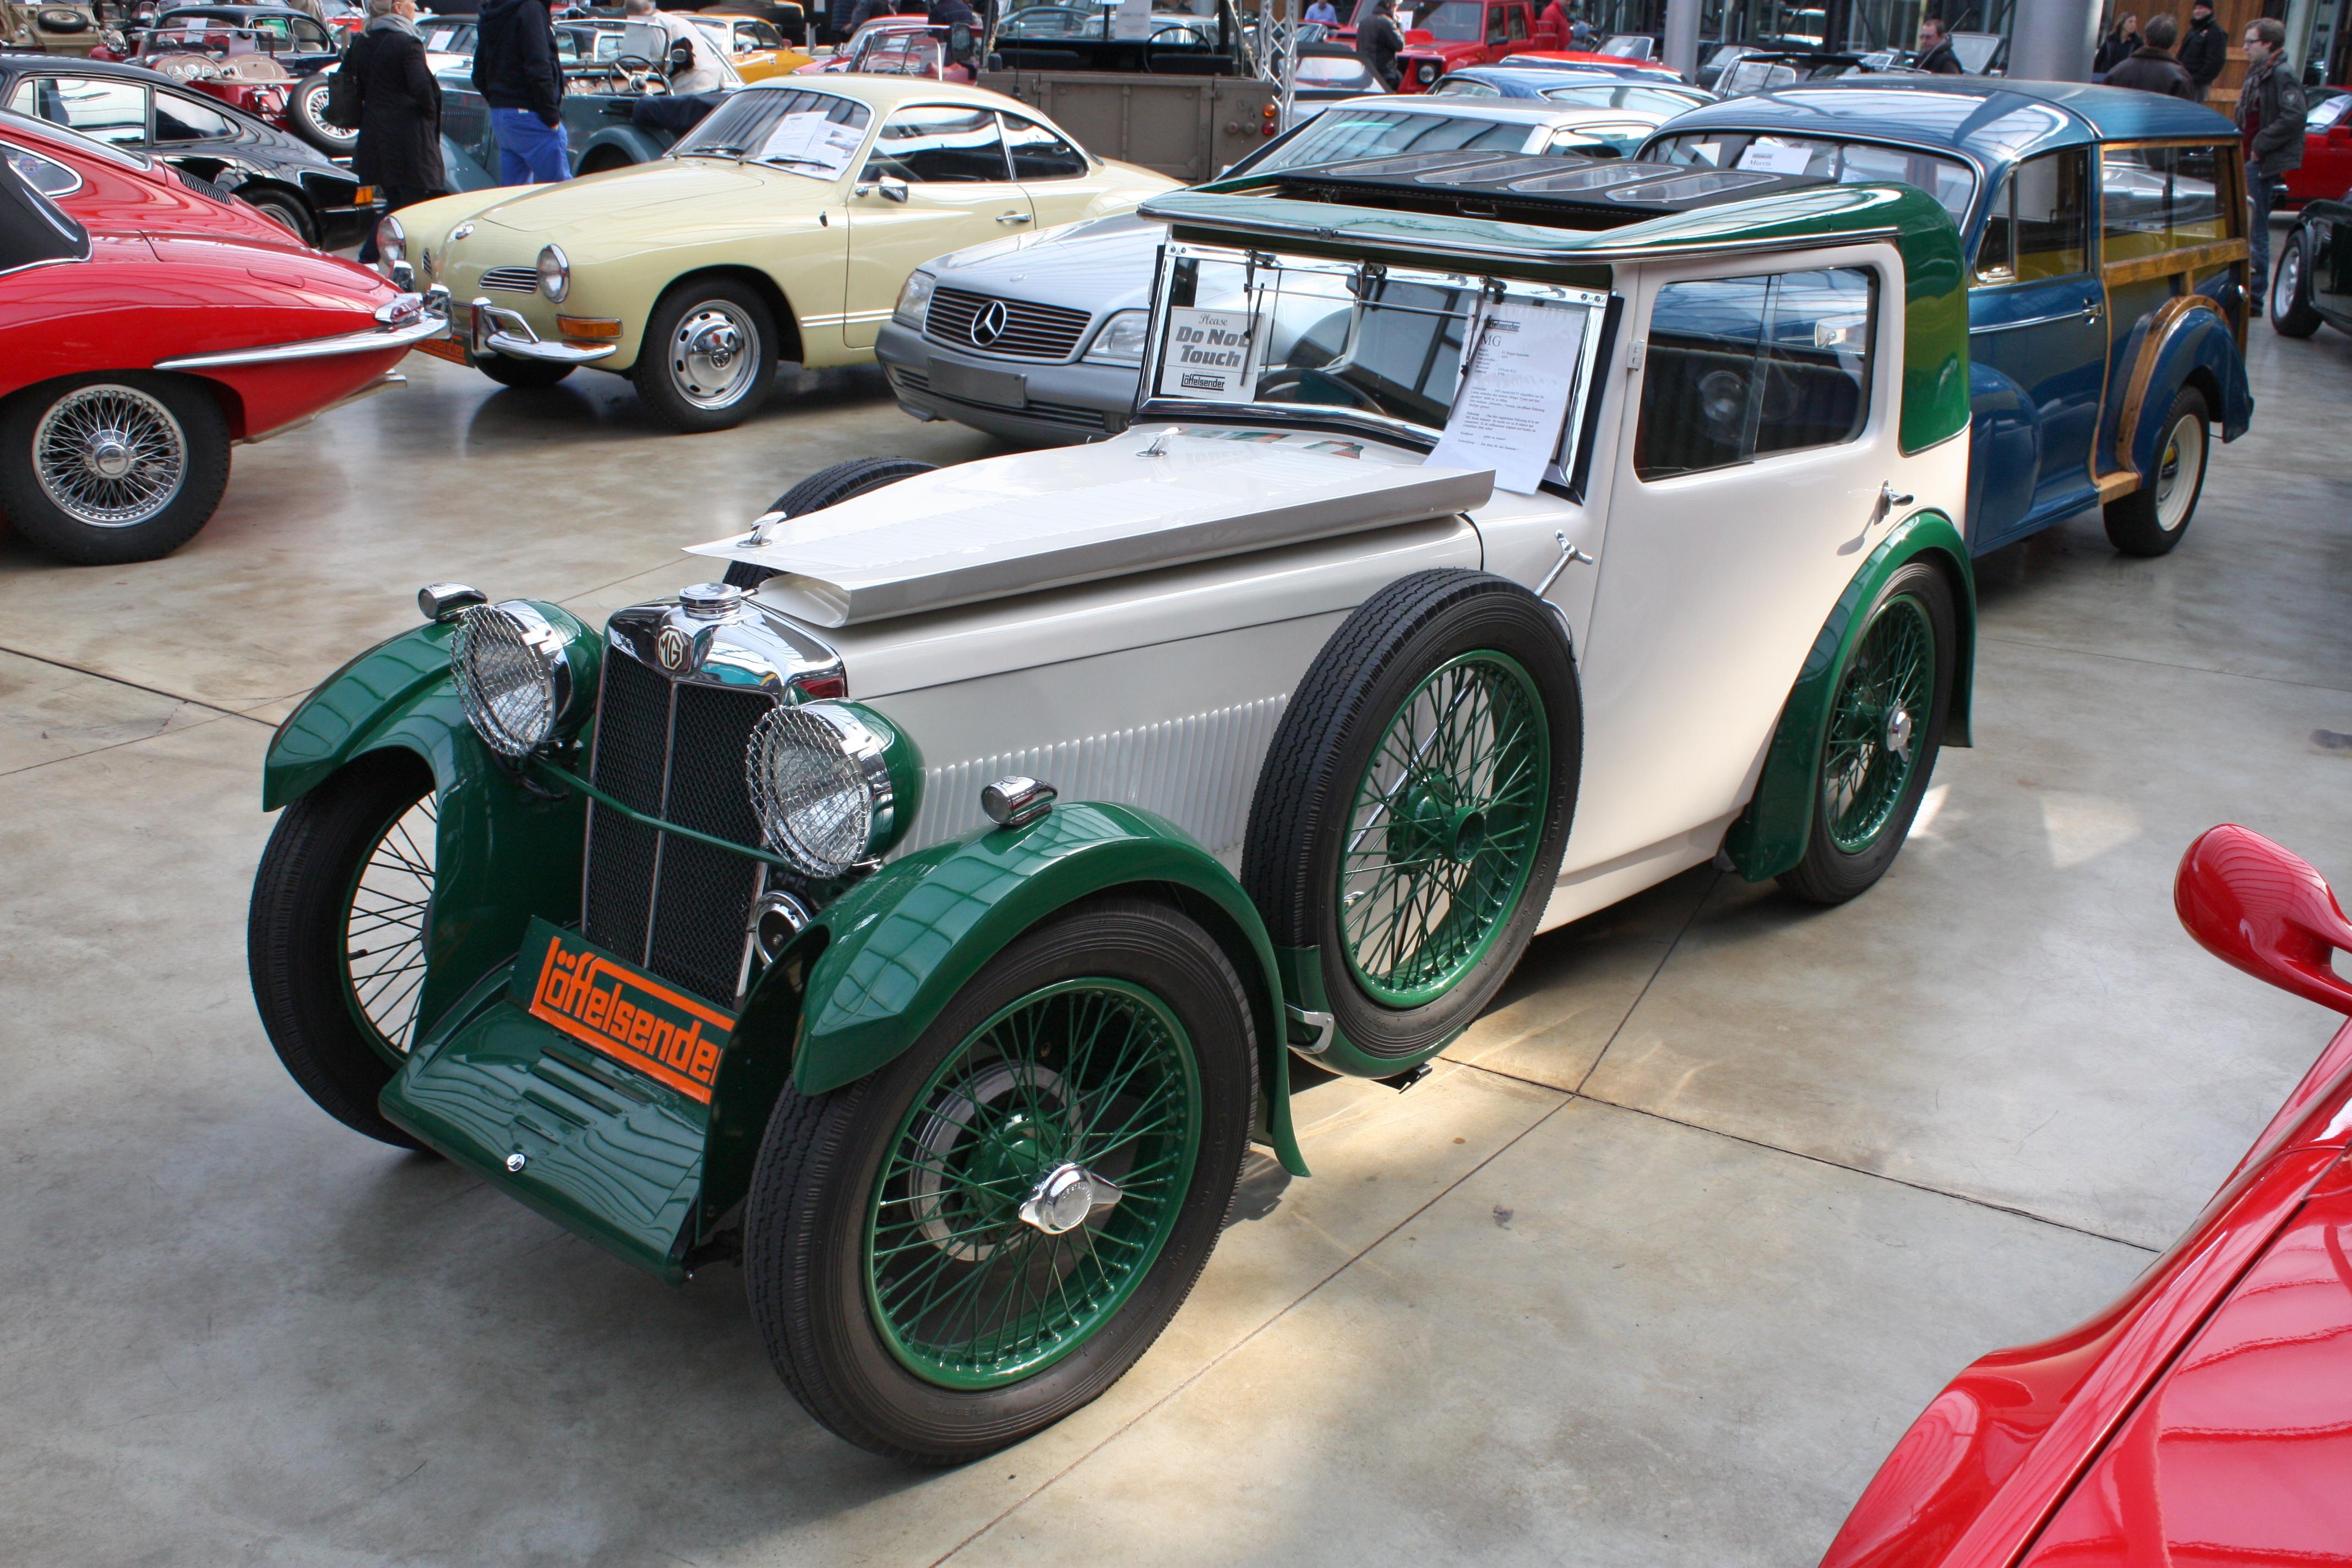 File:MG F1 Magna Salonette 000 000 1931-1933 1933 frontleft 2013-03